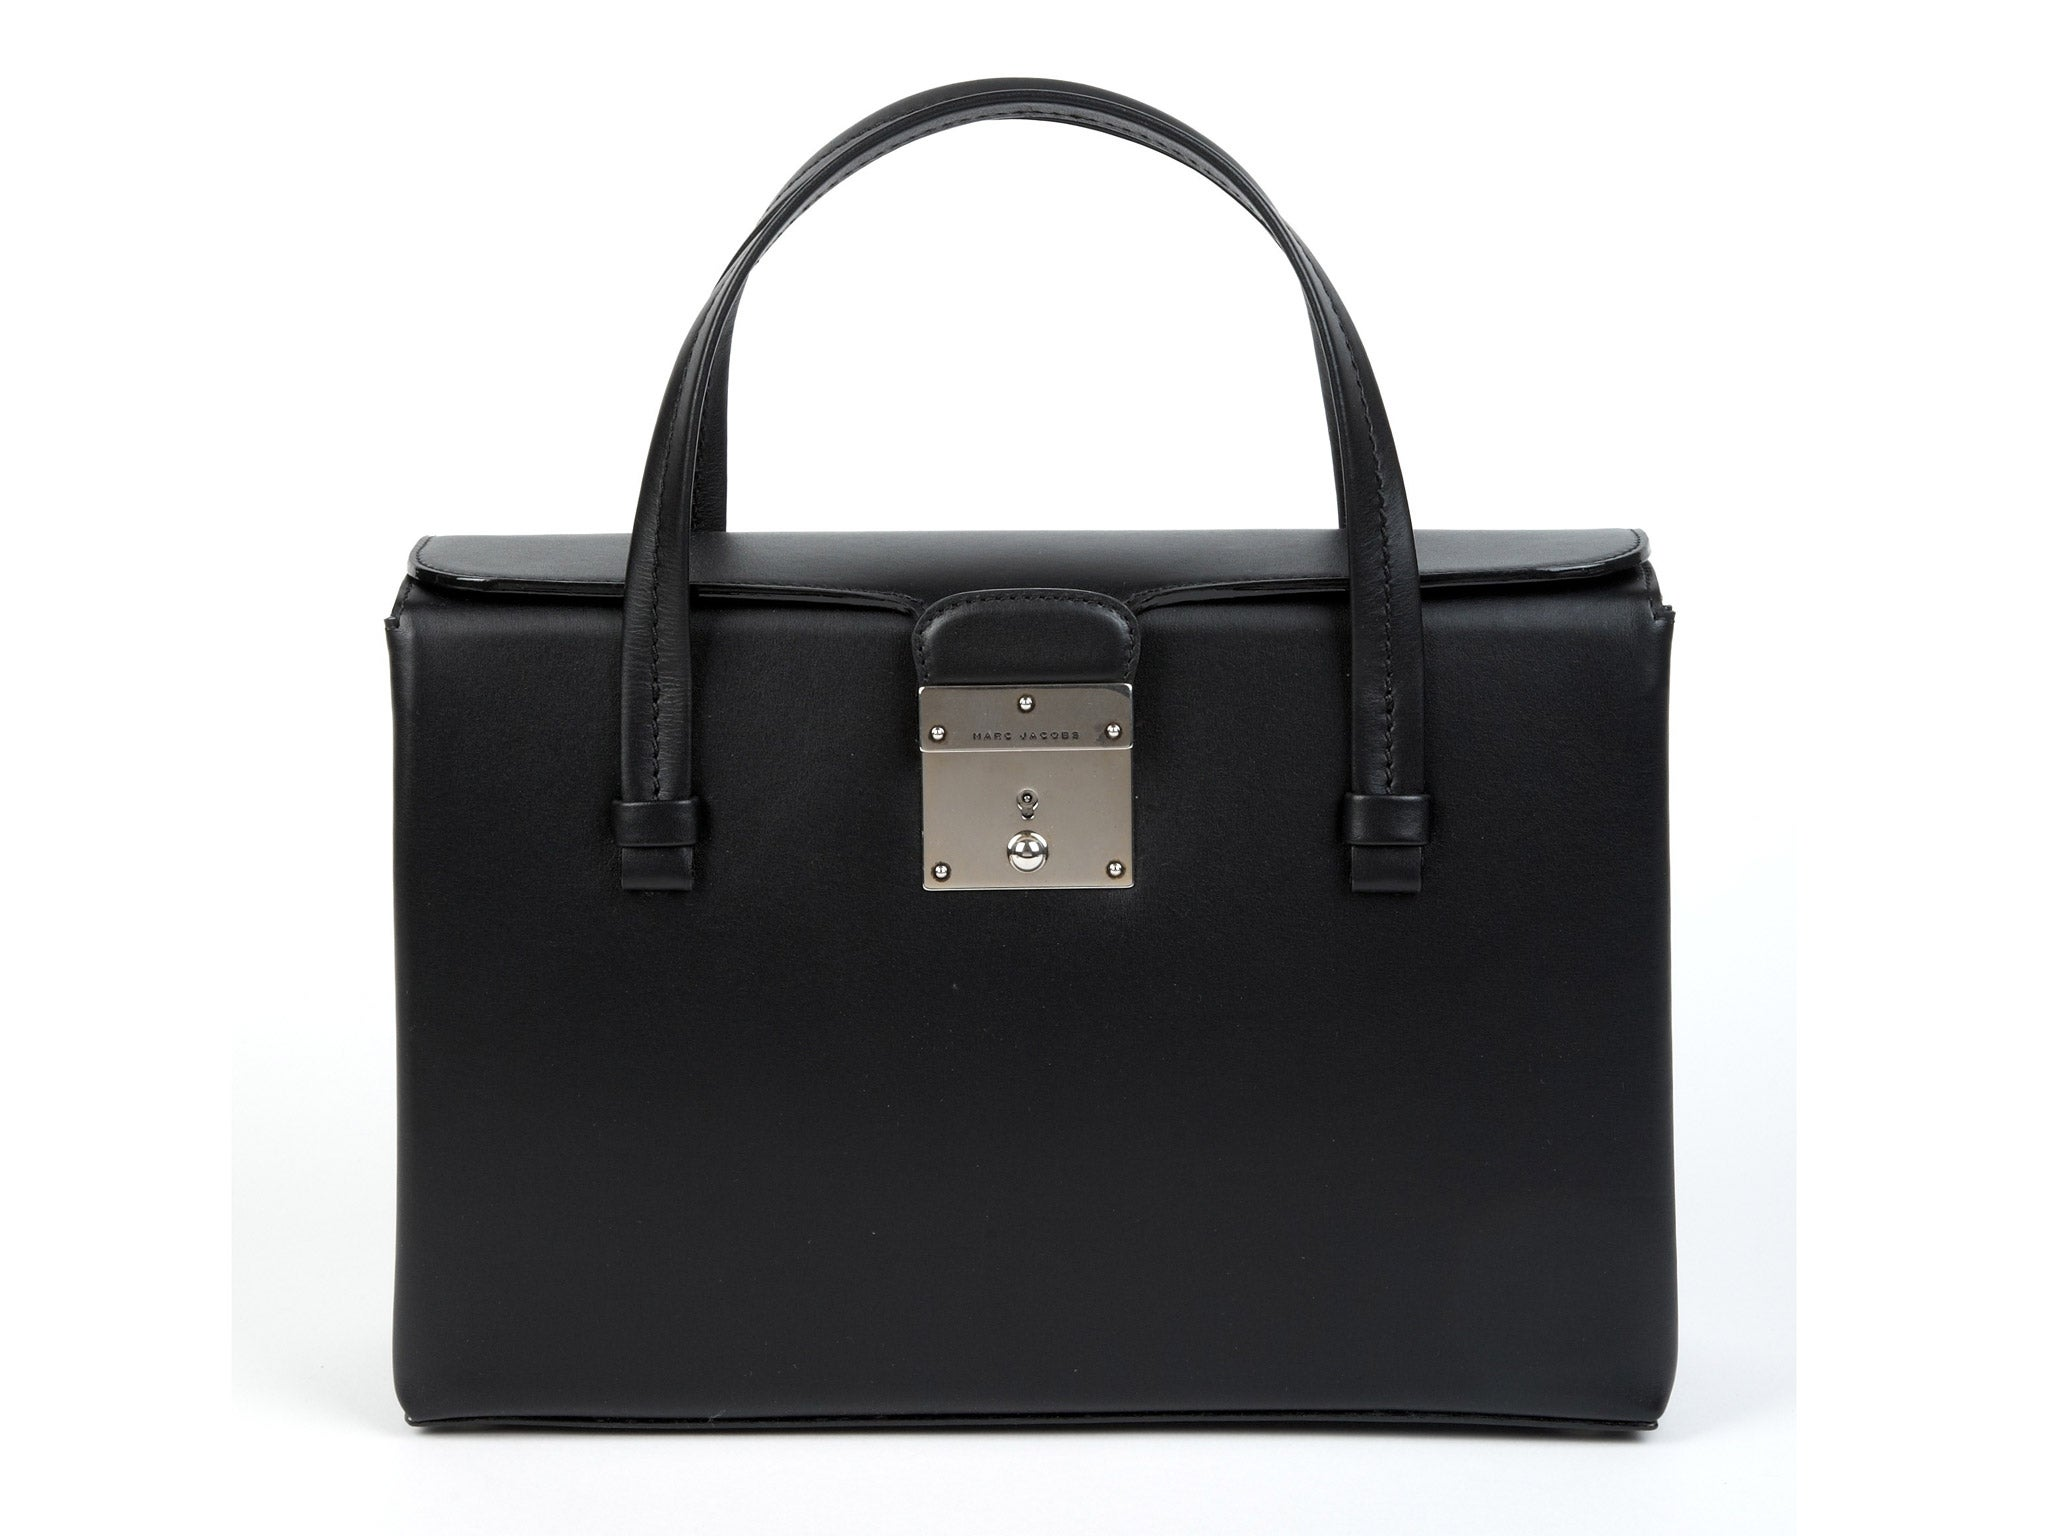 d6f546952fcc The 50 Best handbags